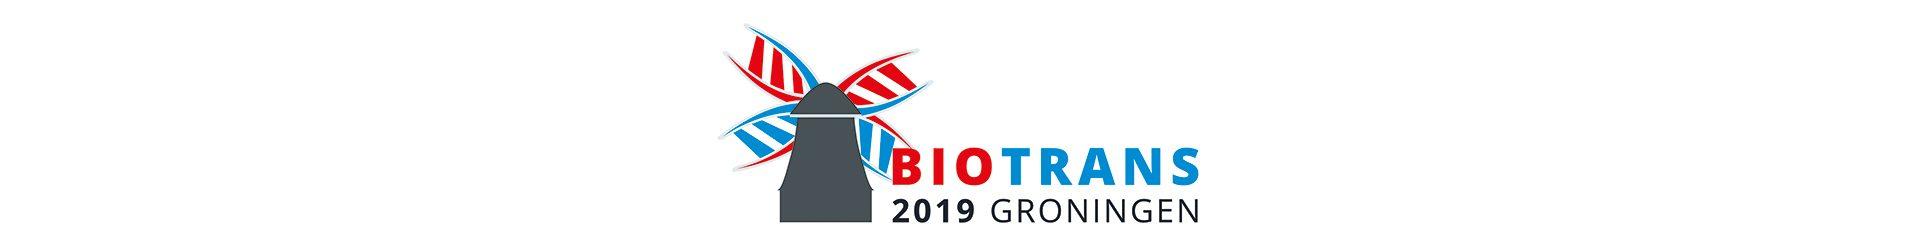 Biotrans 2019